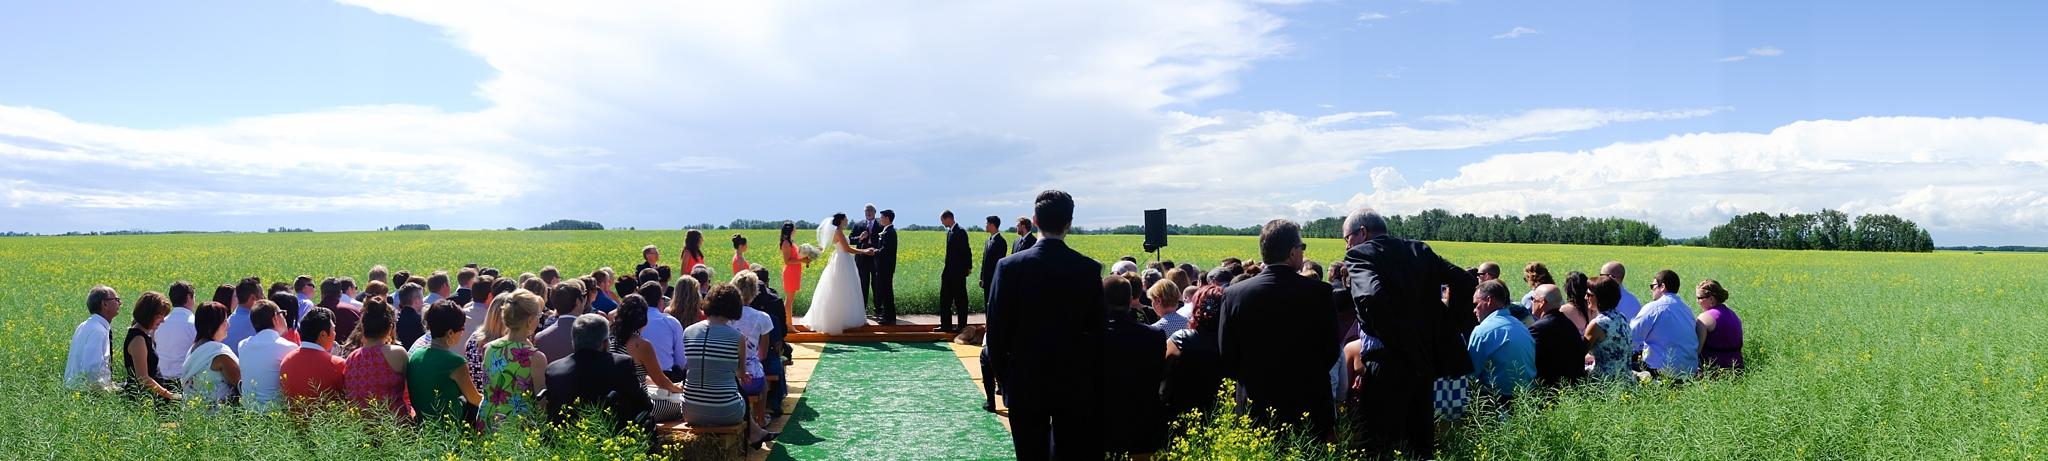 kaihla_tonai_intimate_wedding_elopement_photographer_0056